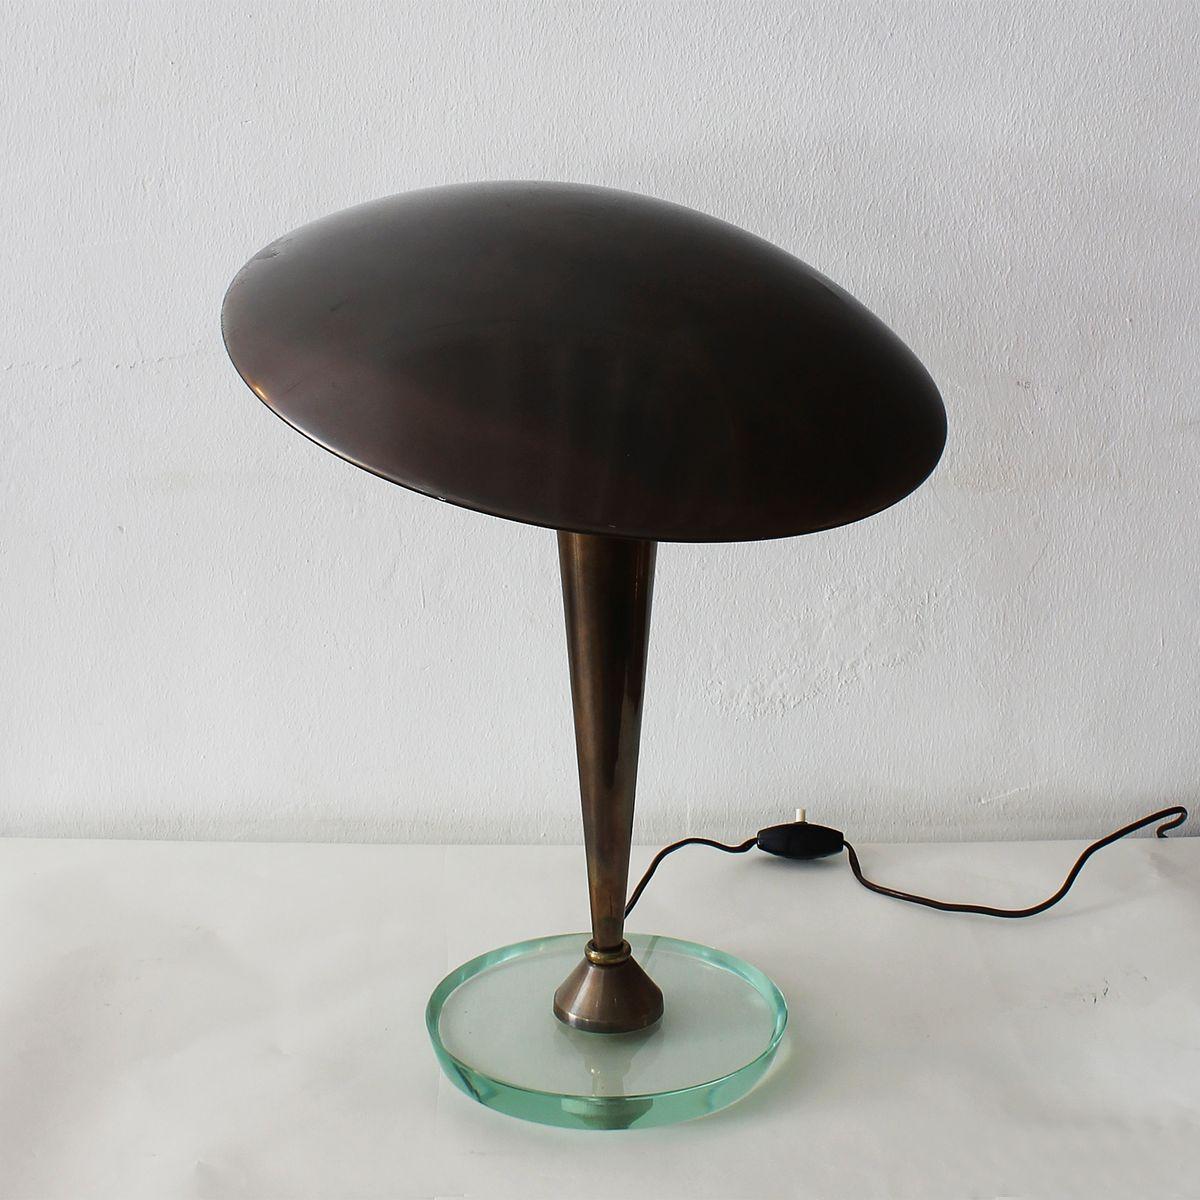 lampe de bureau art d co de stilnovo italie 1930s en vente sur pamono. Black Bedroom Furniture Sets. Home Design Ideas